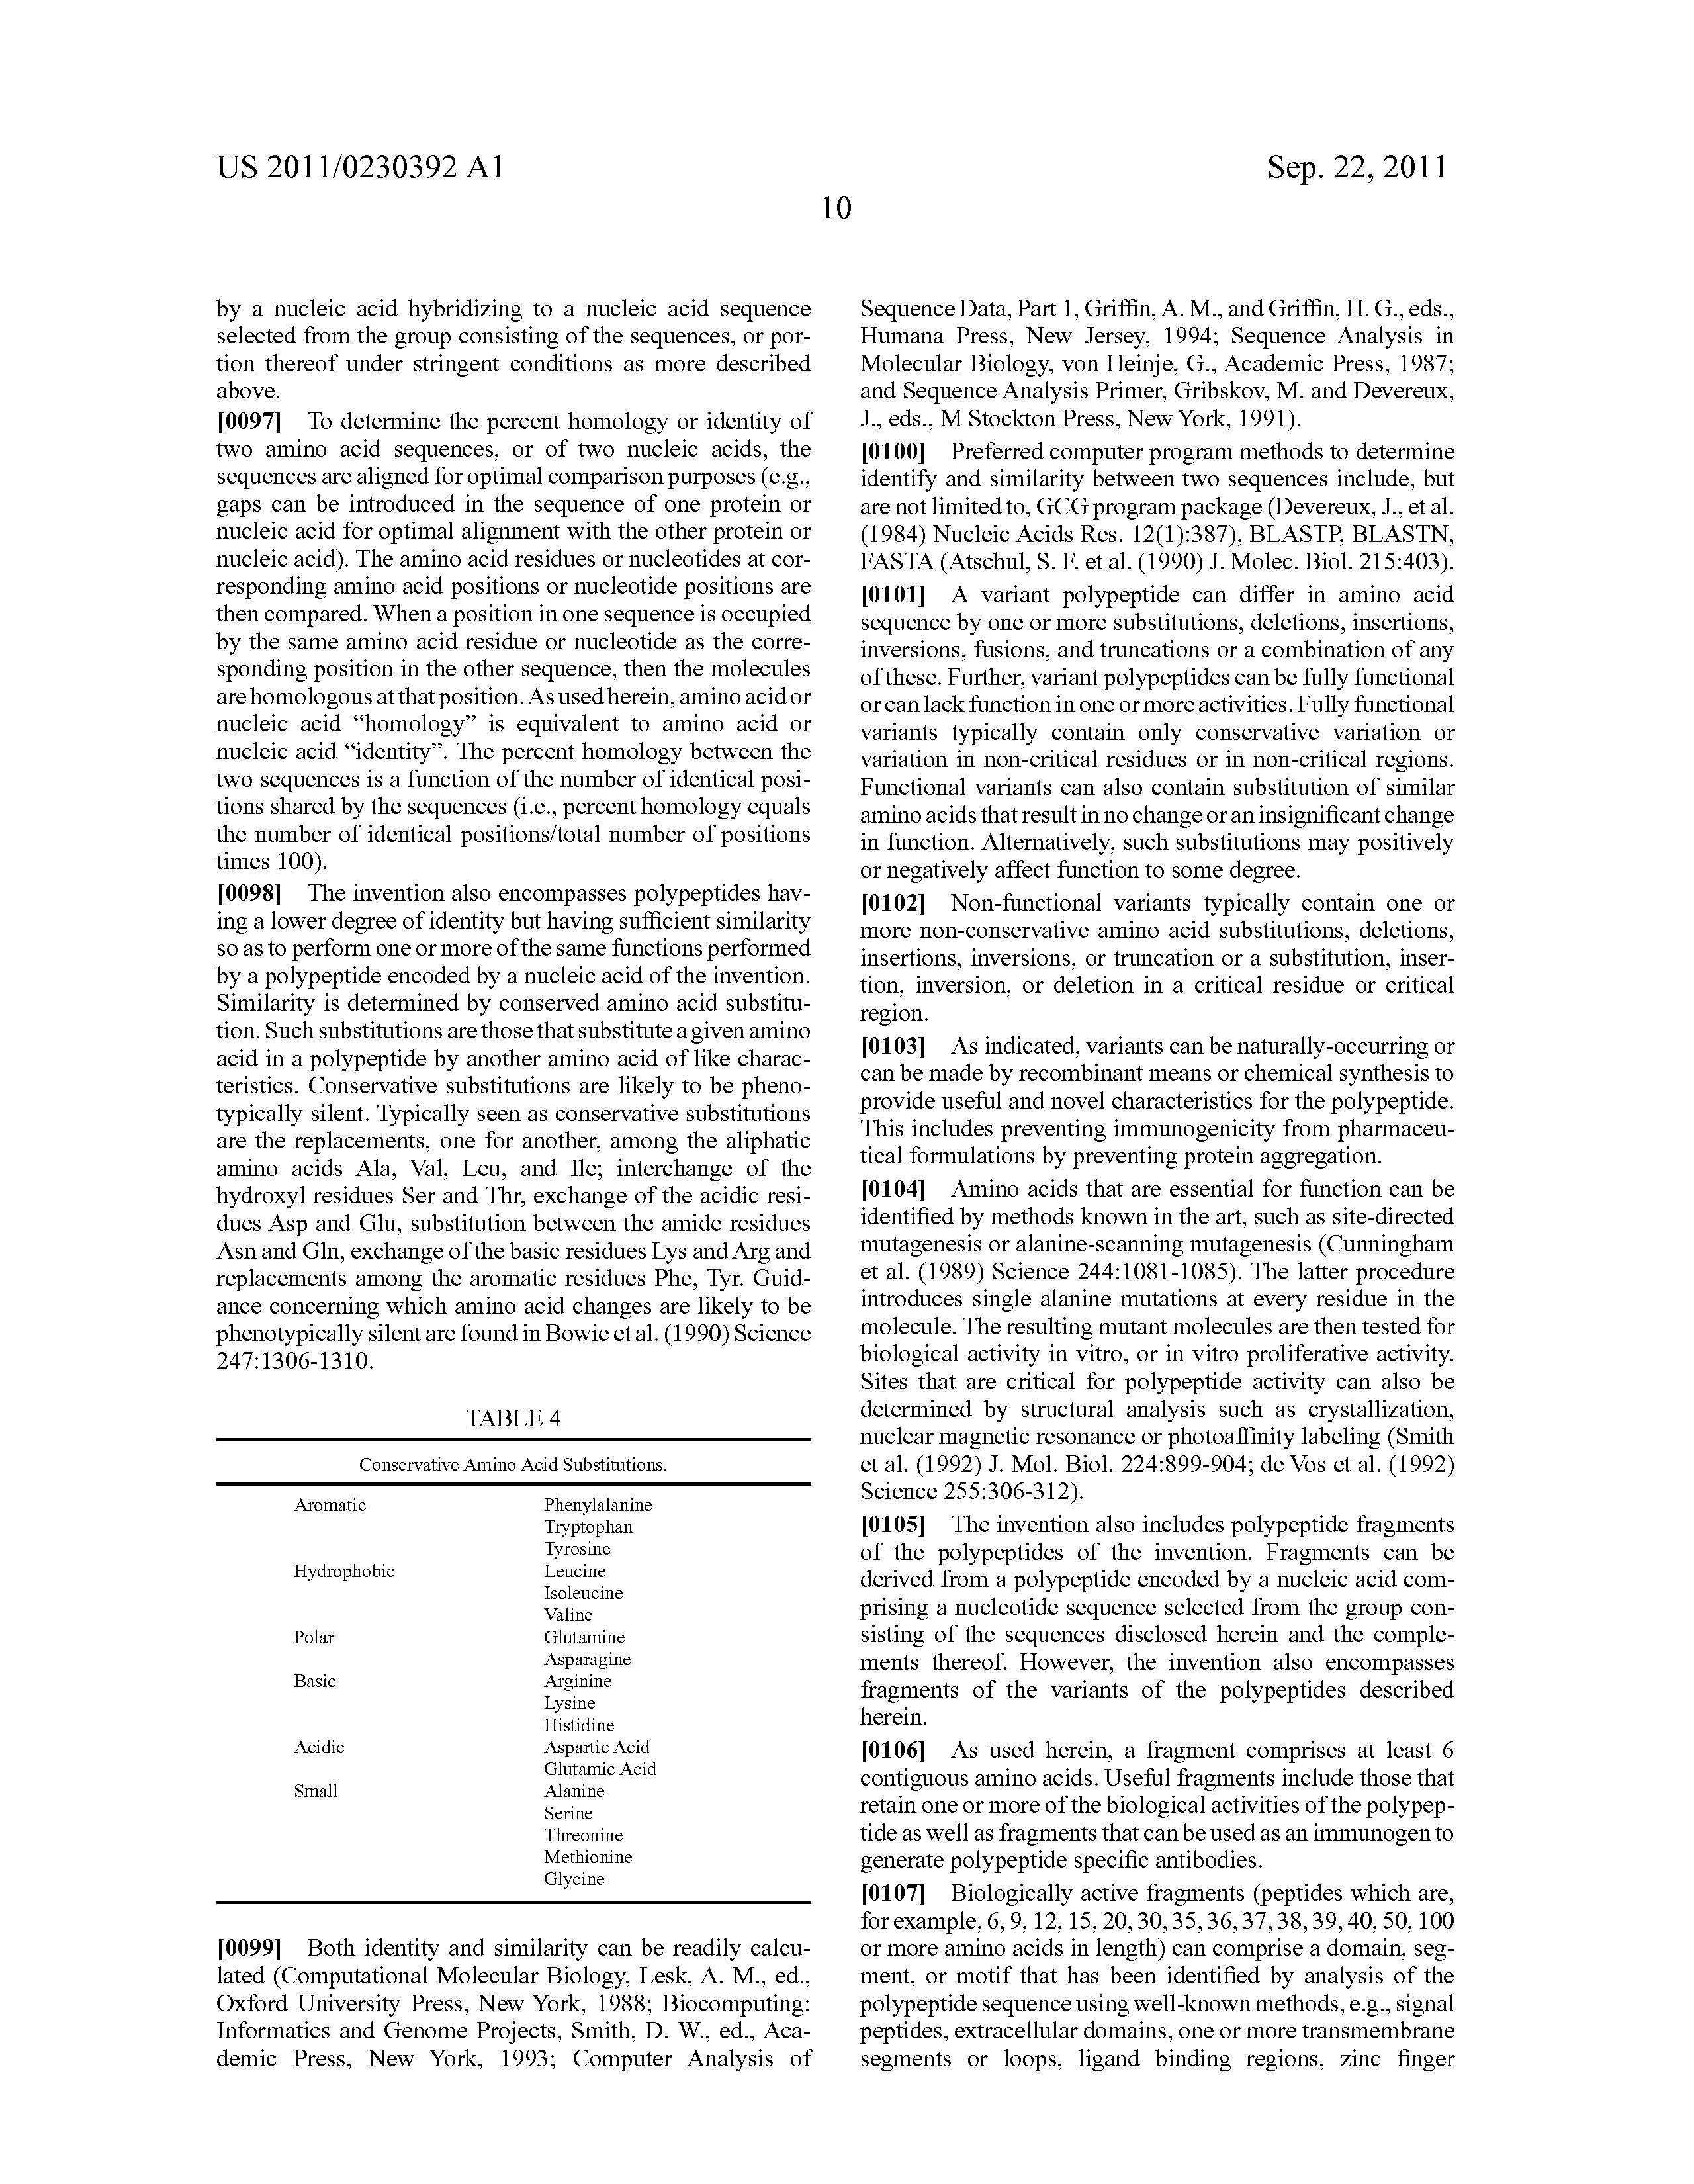 Narc übersetzung